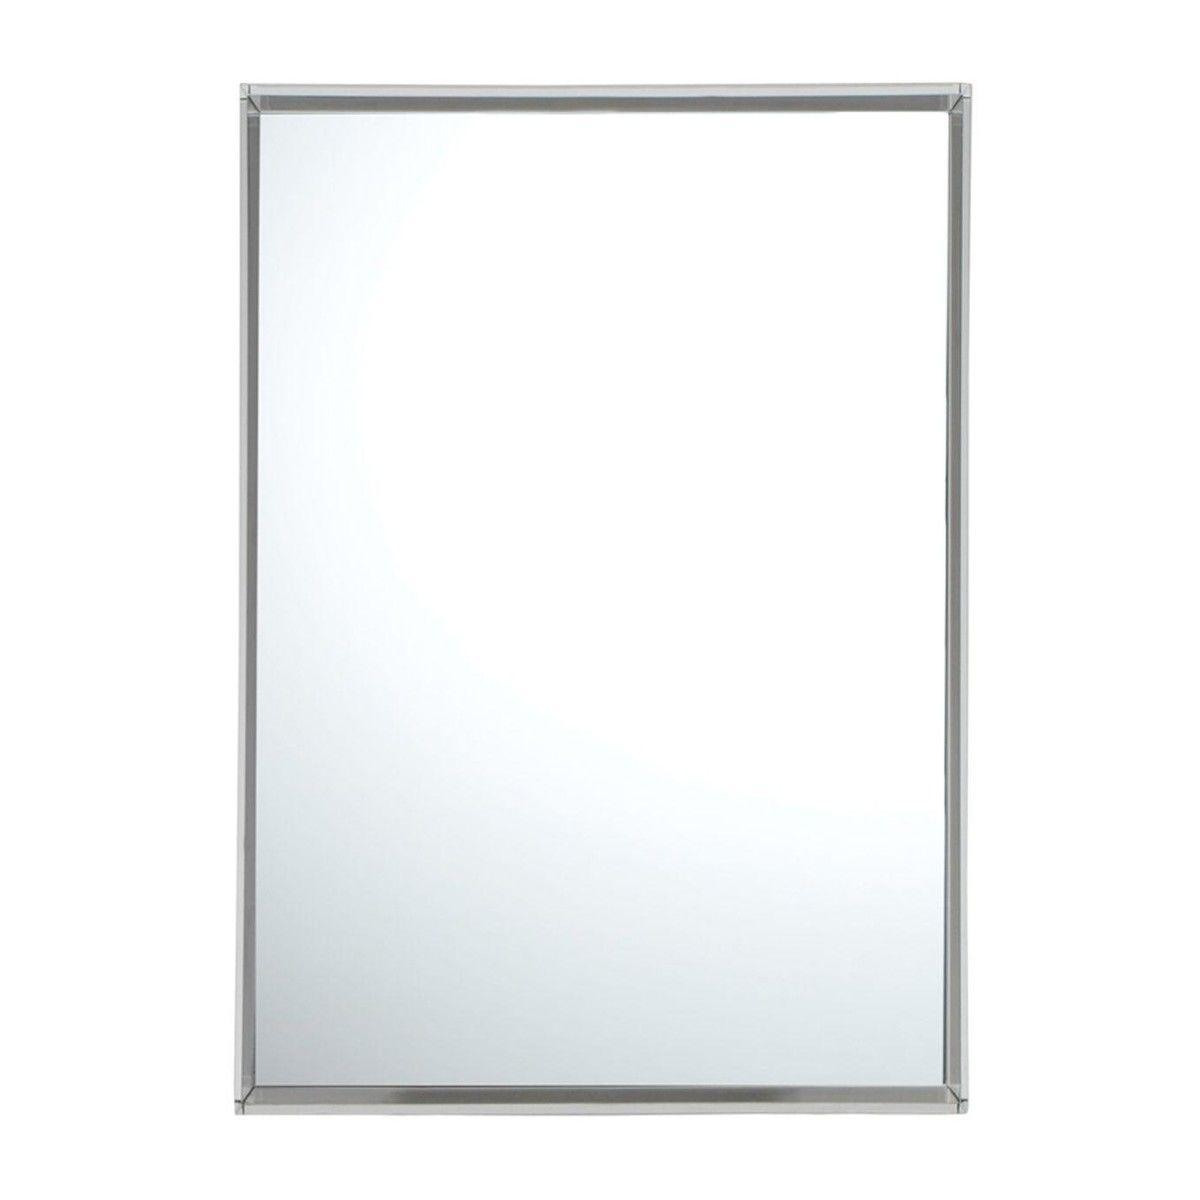 Only me spiegel 50x70 kartell for Spiegel id